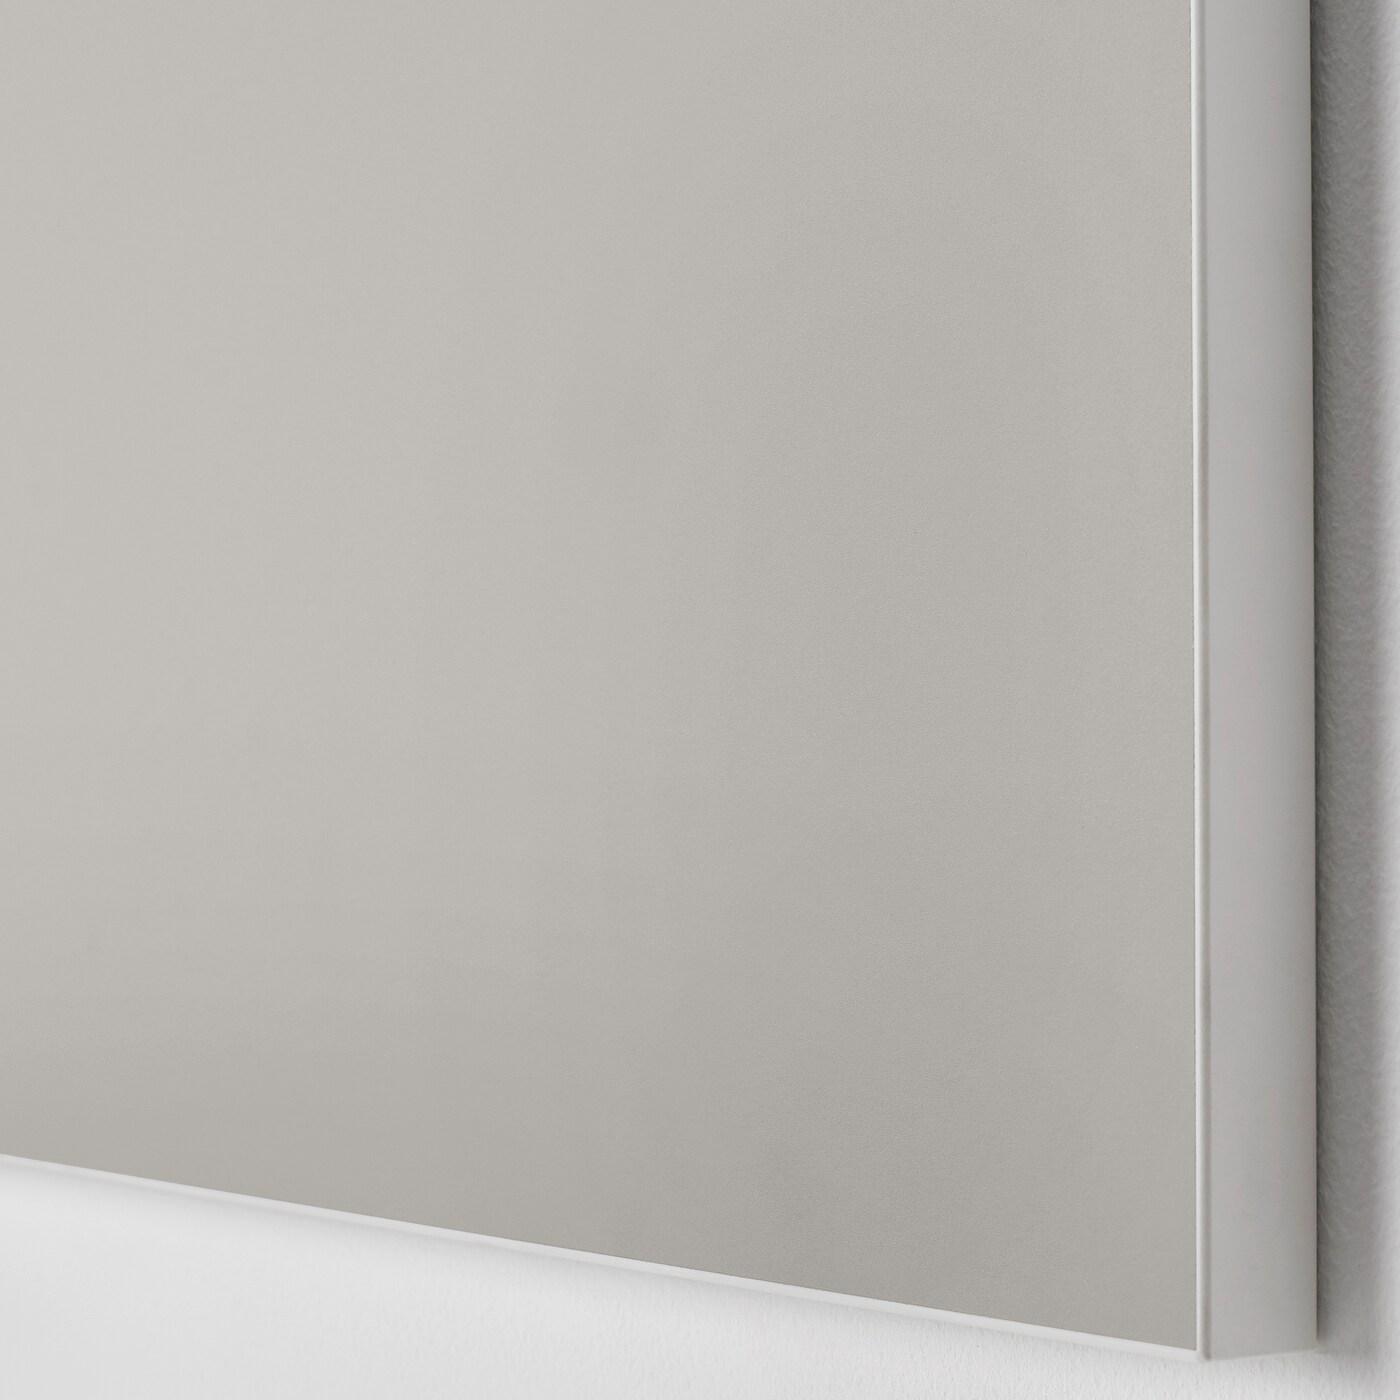 SKATVAL Dörr, ljusgrå, 40x180 cm